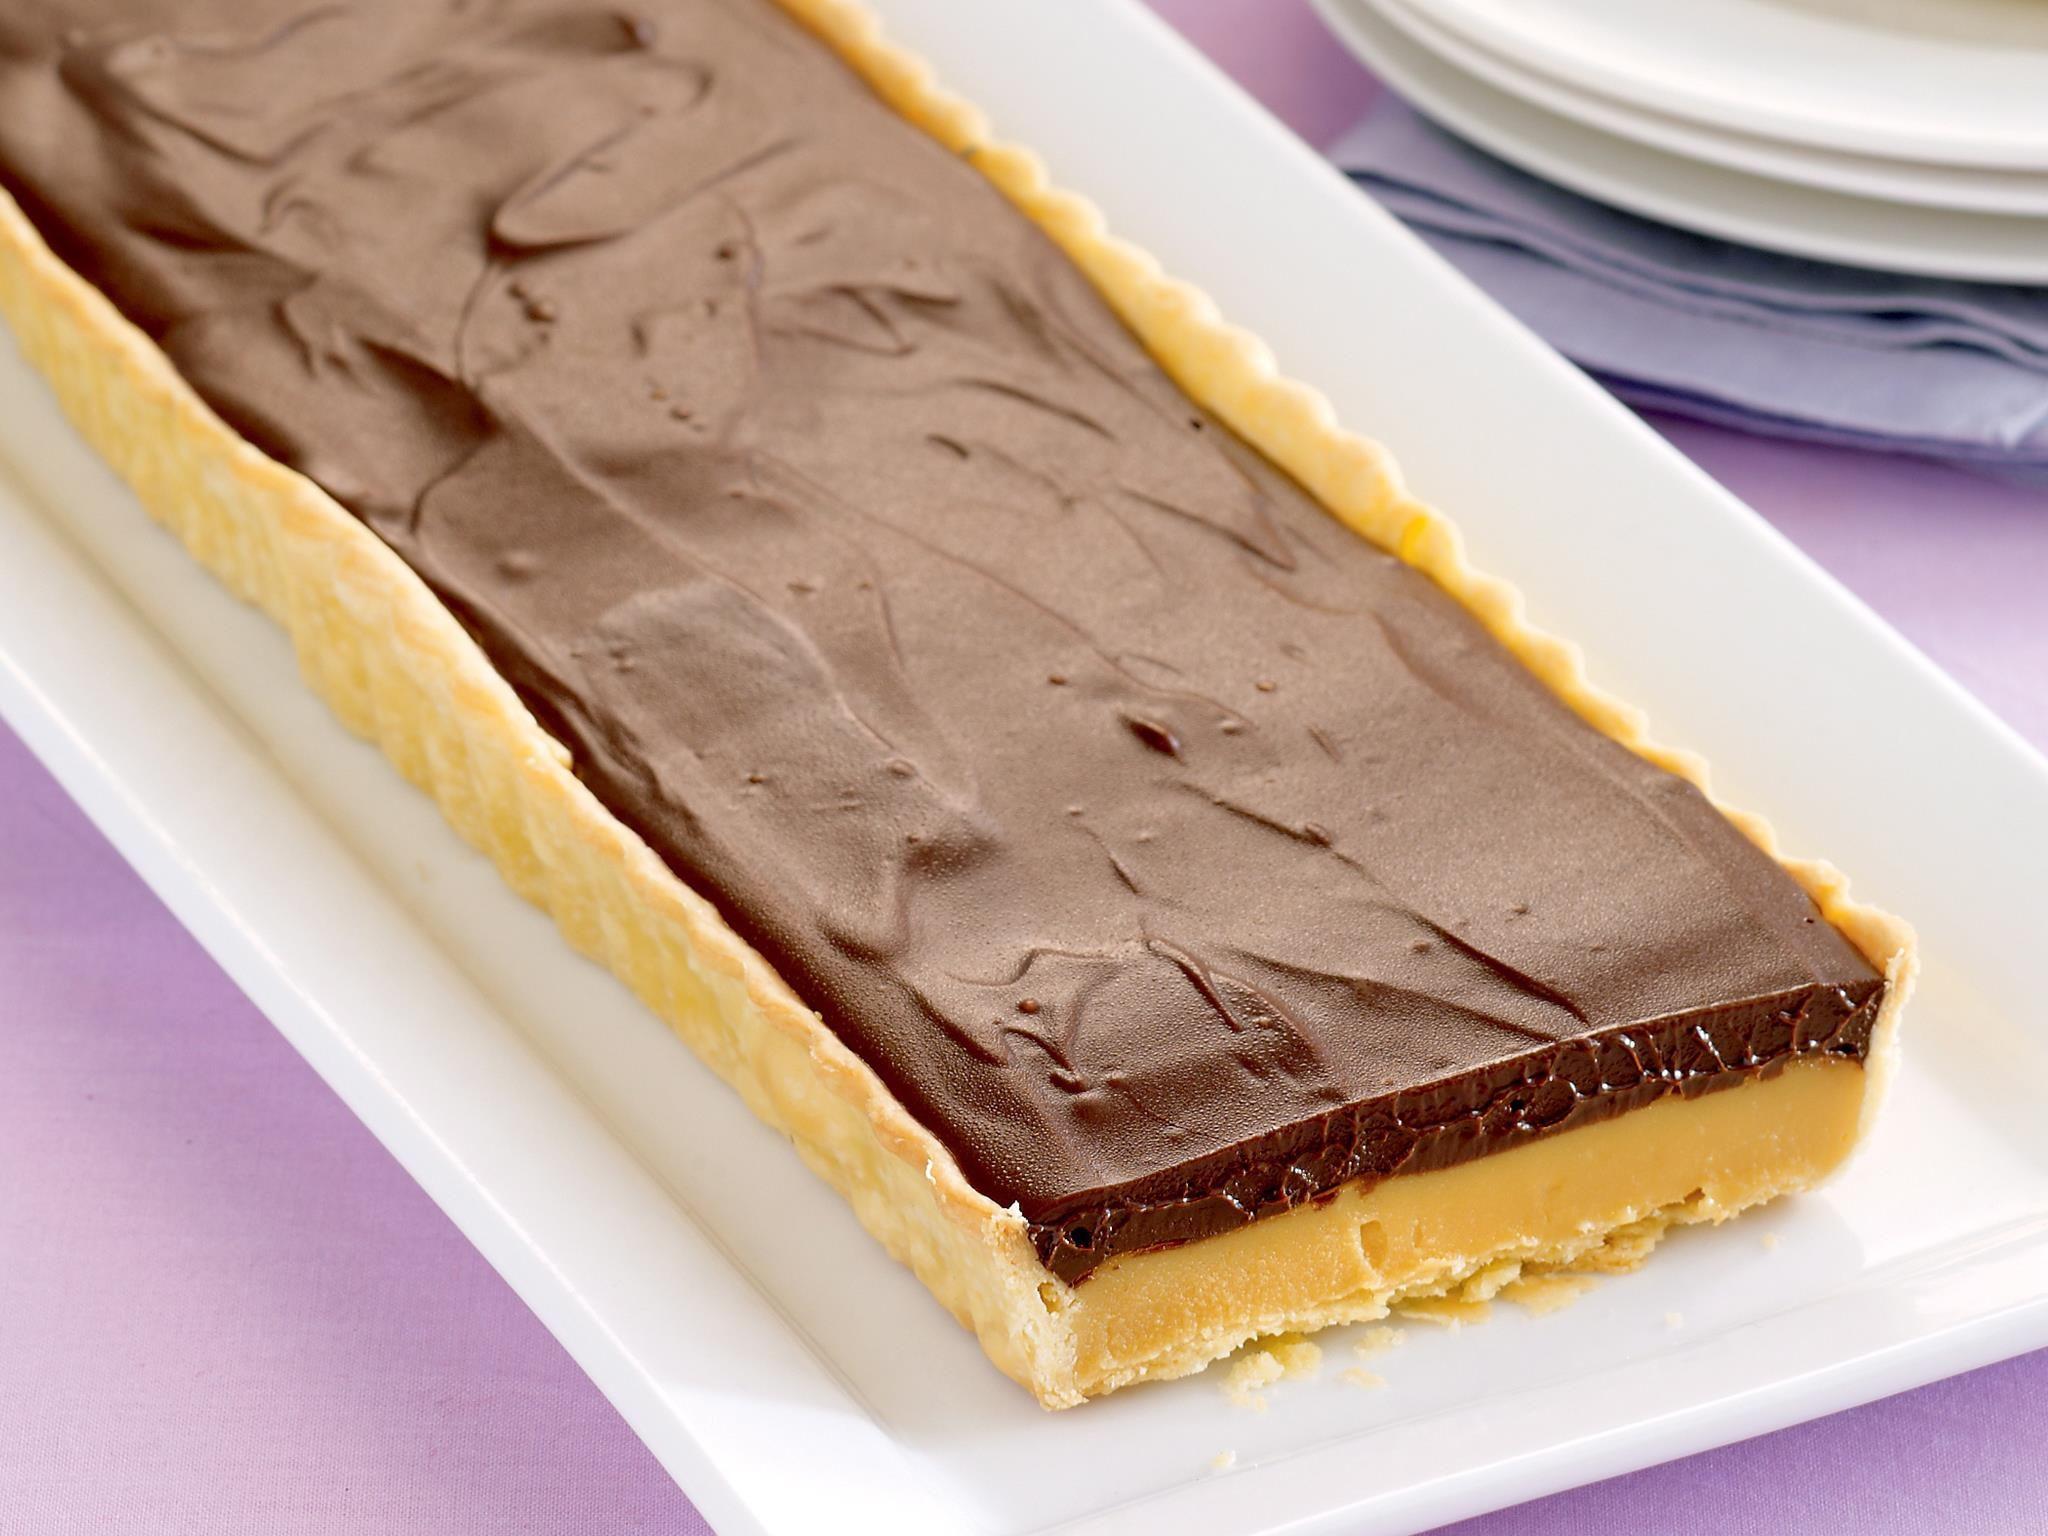 Chocolate Caramel Tart Recipe Shortcrust Pastry Tarts Sweet Tarts Chocolate Caramel Tart